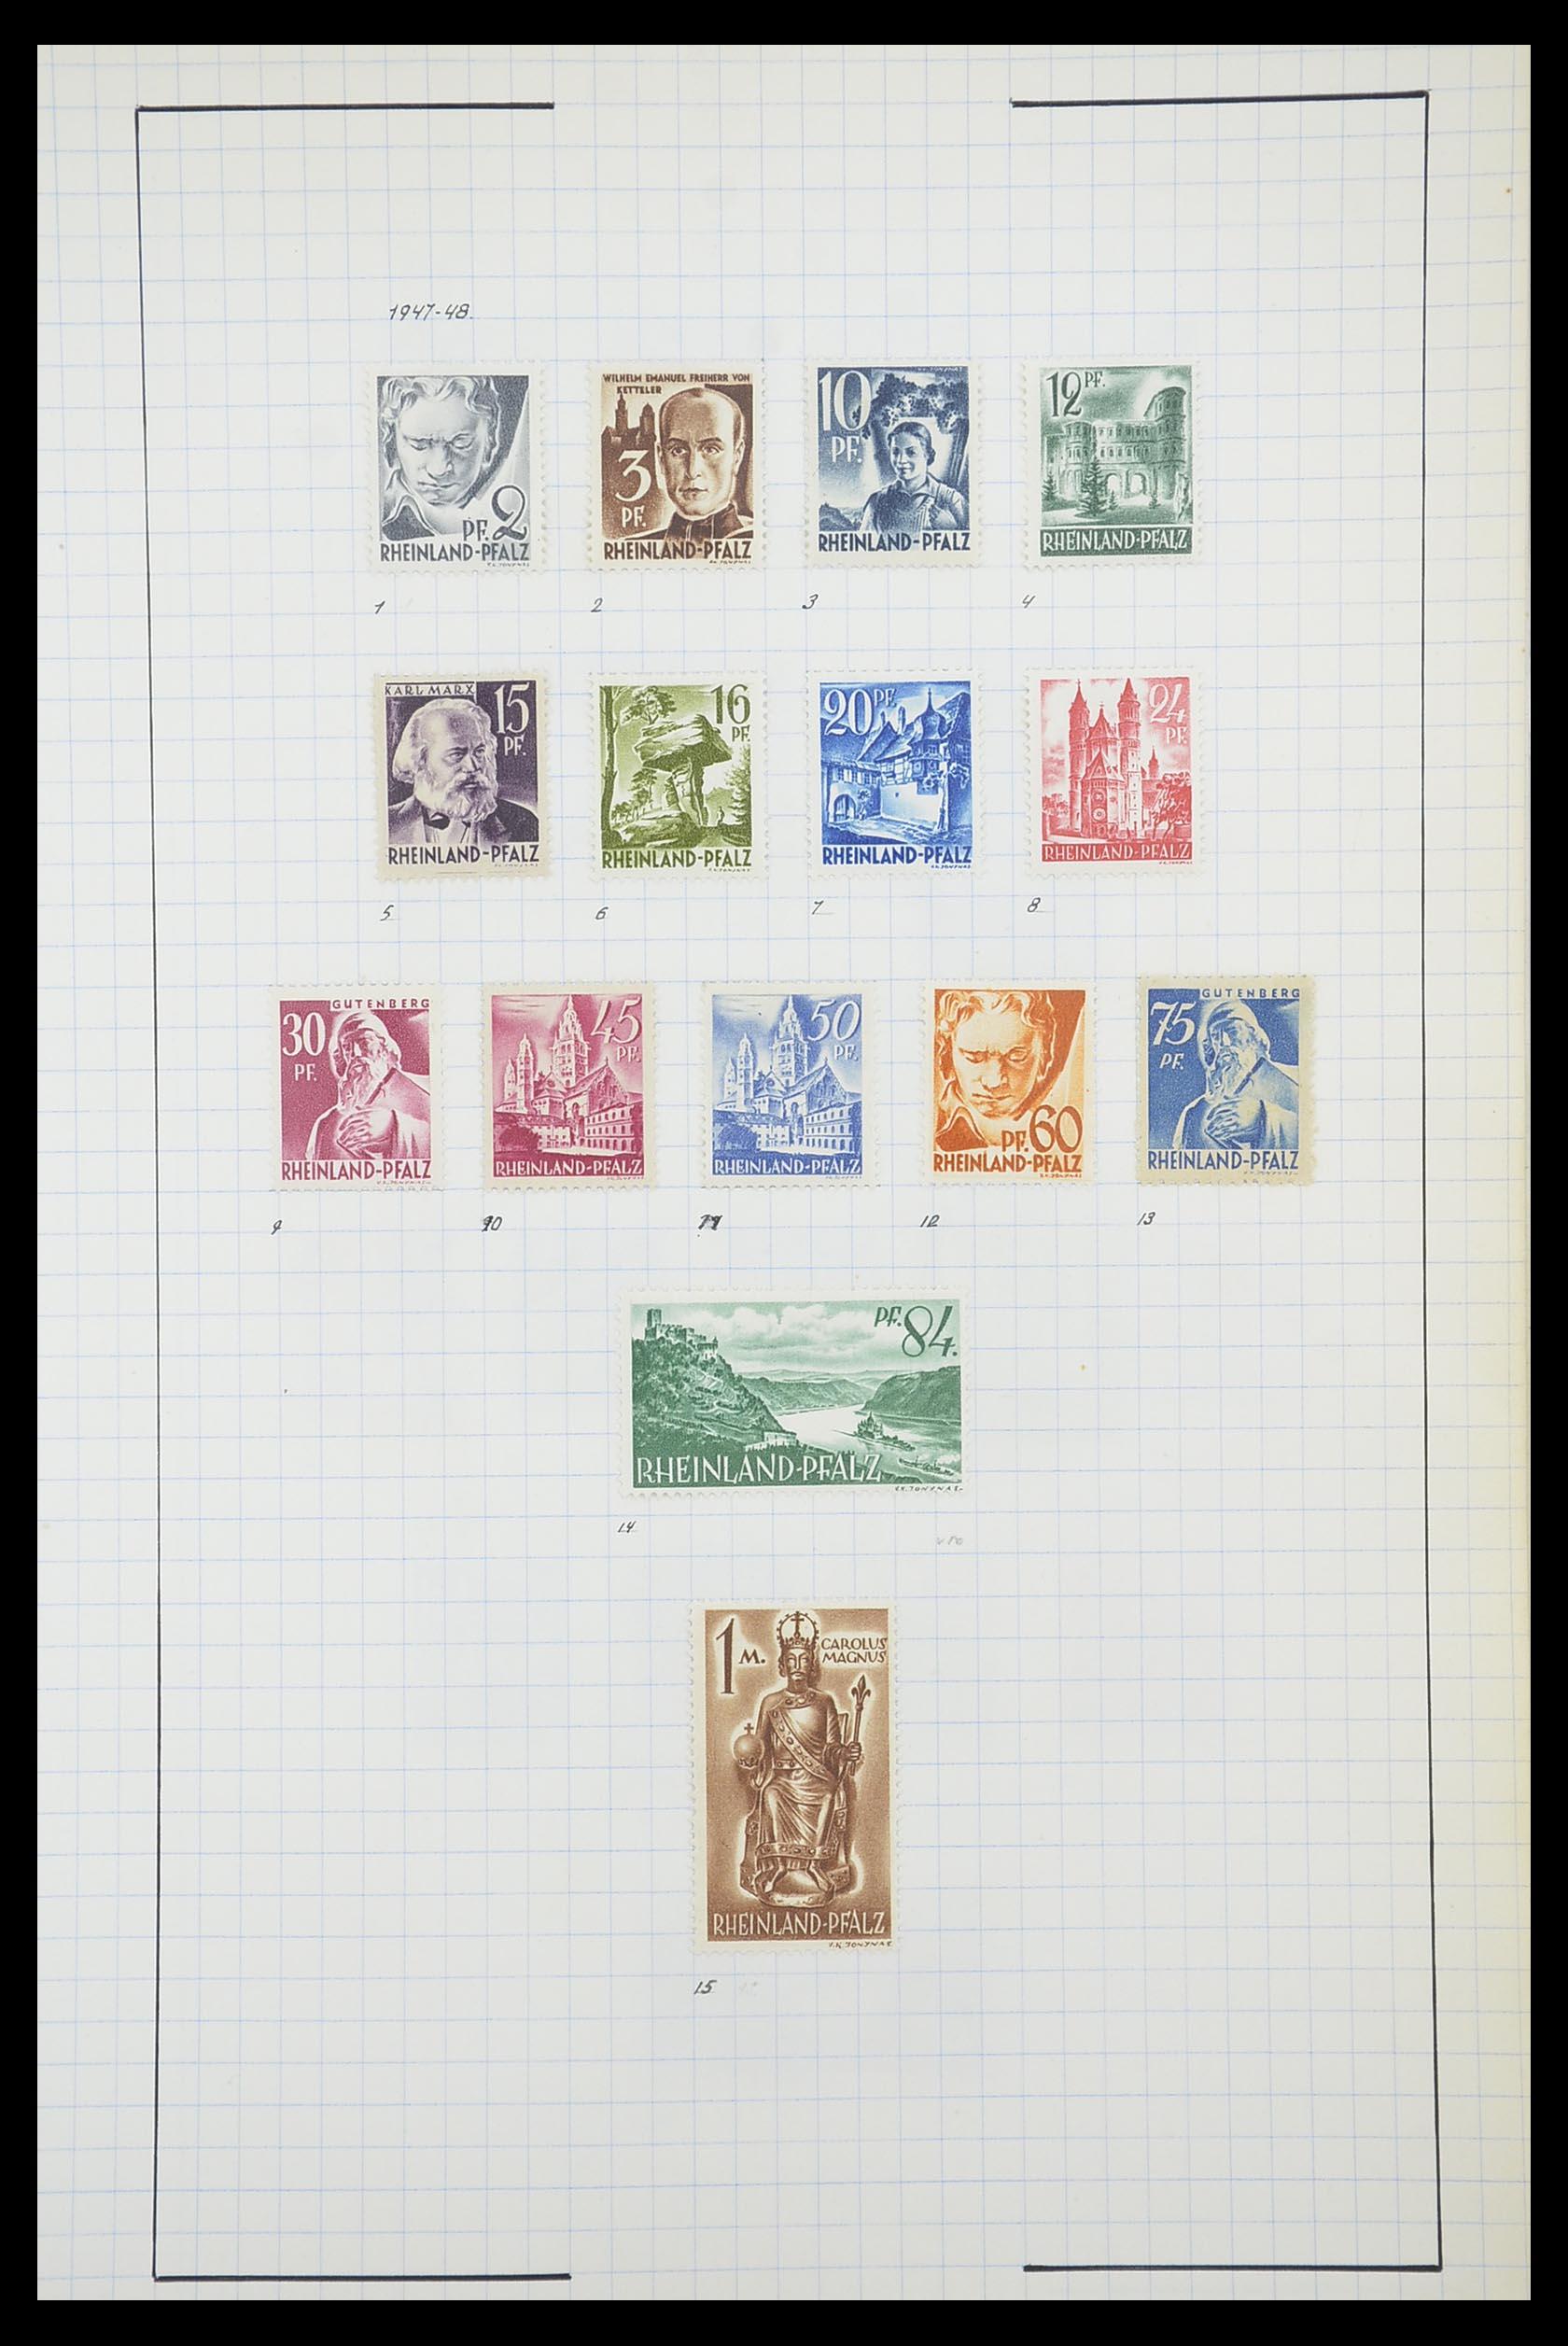 33864 015 - Postzegelverzameling 33864 Franse Zone 1945-1949.